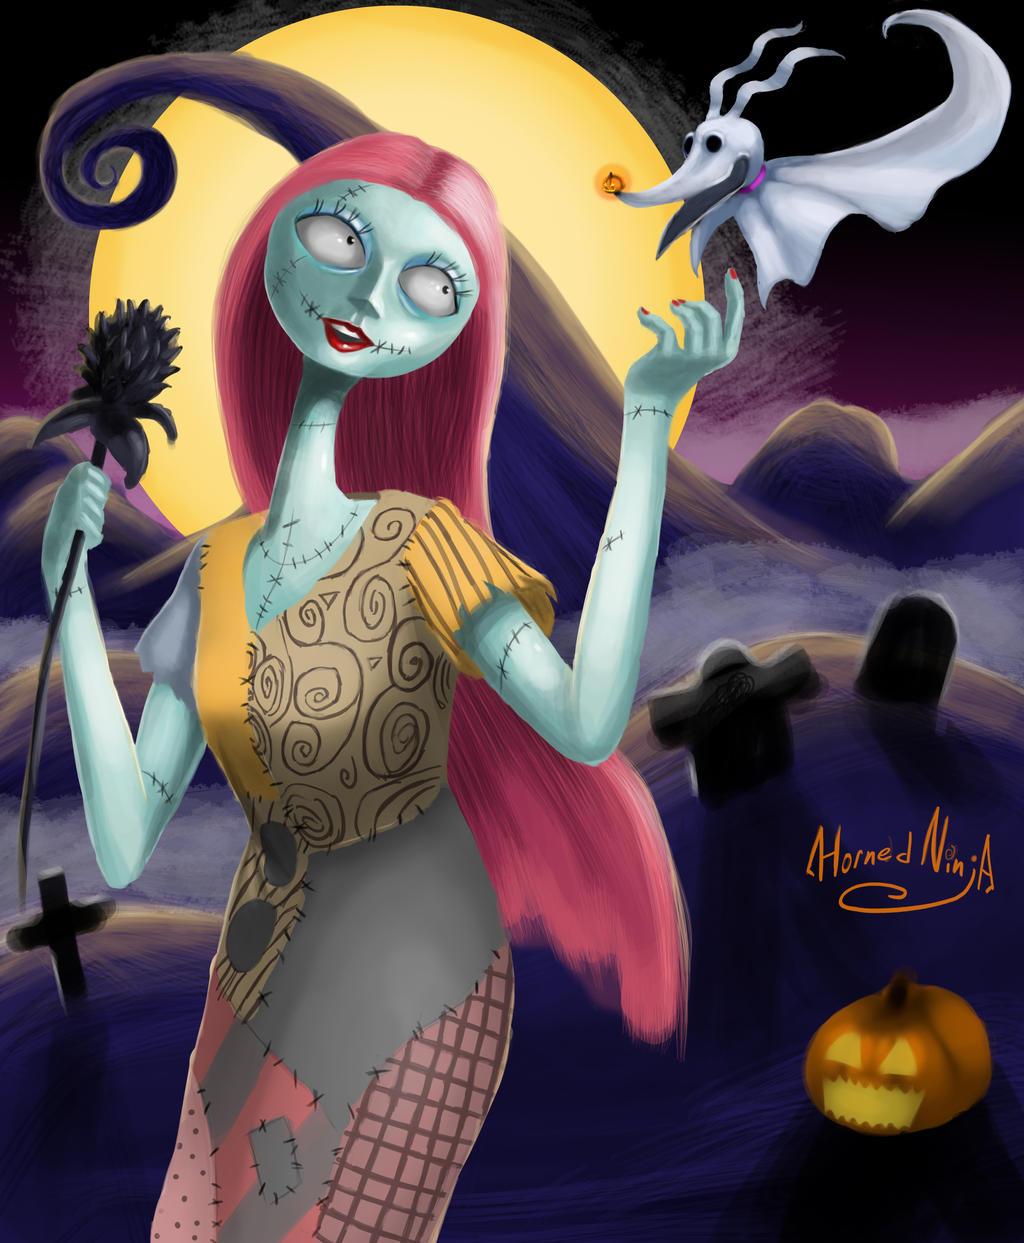 Sally, The Nightmare Before Christmas By HornedNinja On